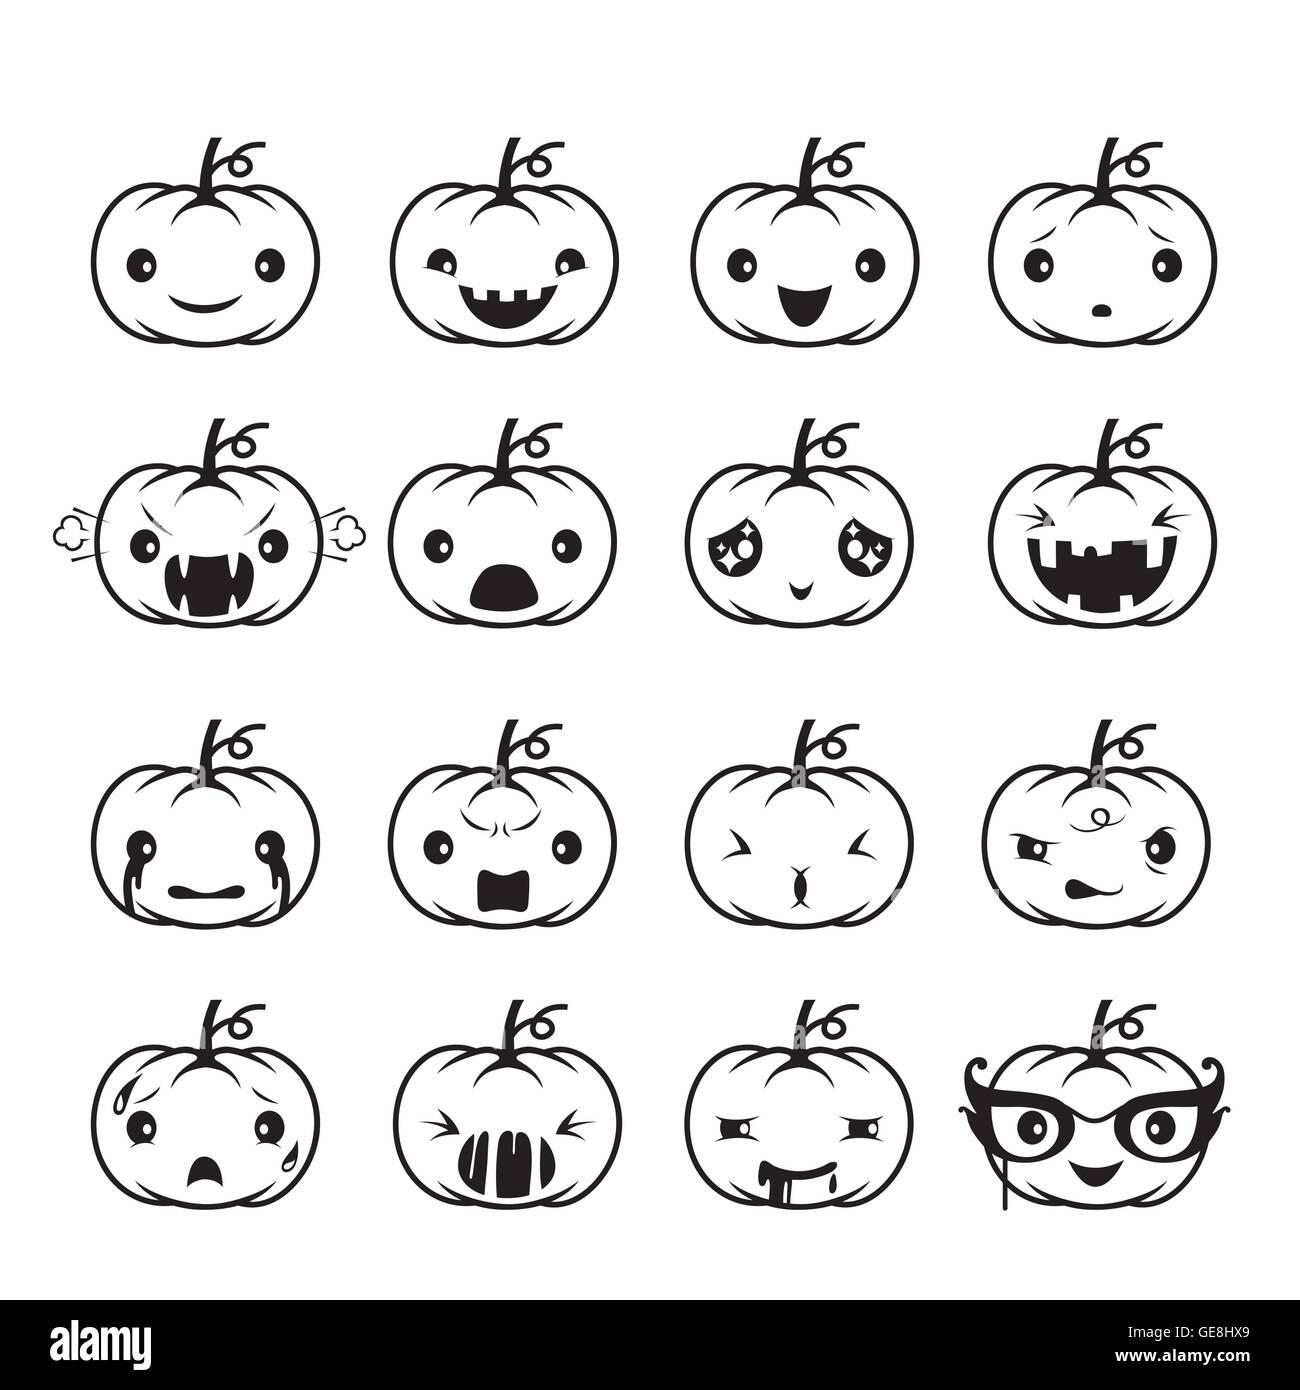 Pumpkin Emoticons Set, Holiday, Mystery, emoji, facial expression, feeling, mood, personality, symbol, October - Stock Vector